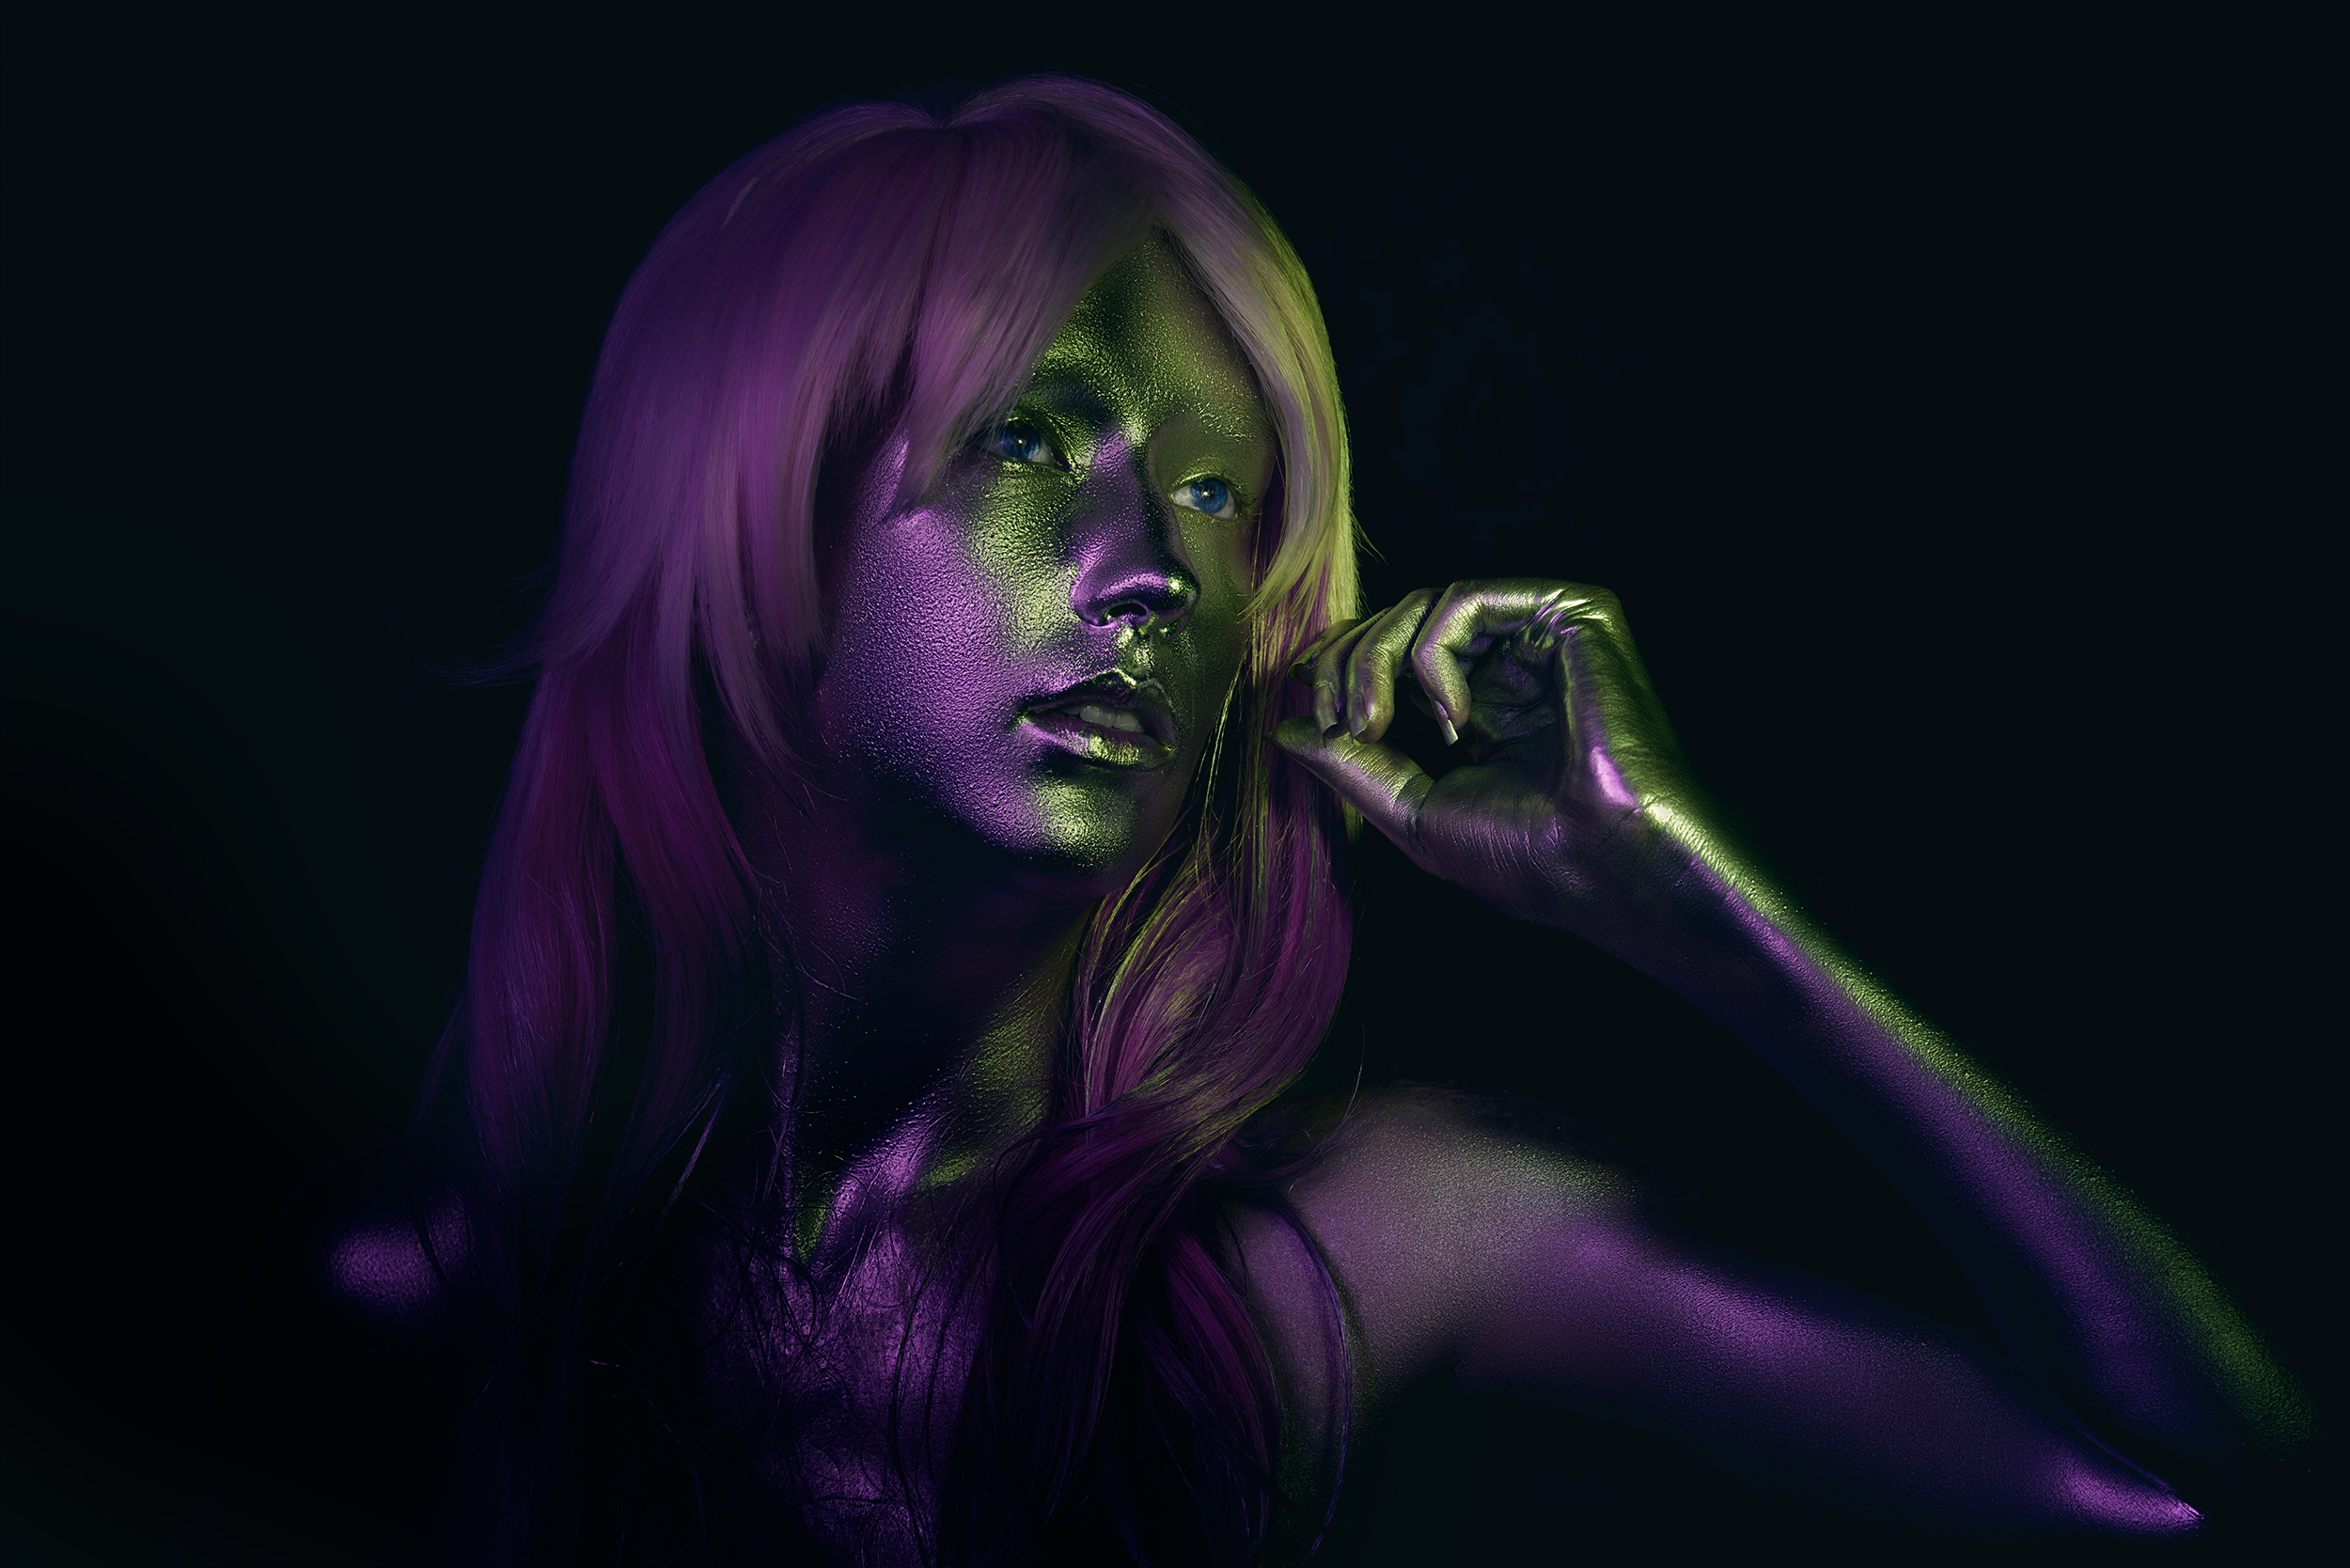 Creative lighting portrait of a female model